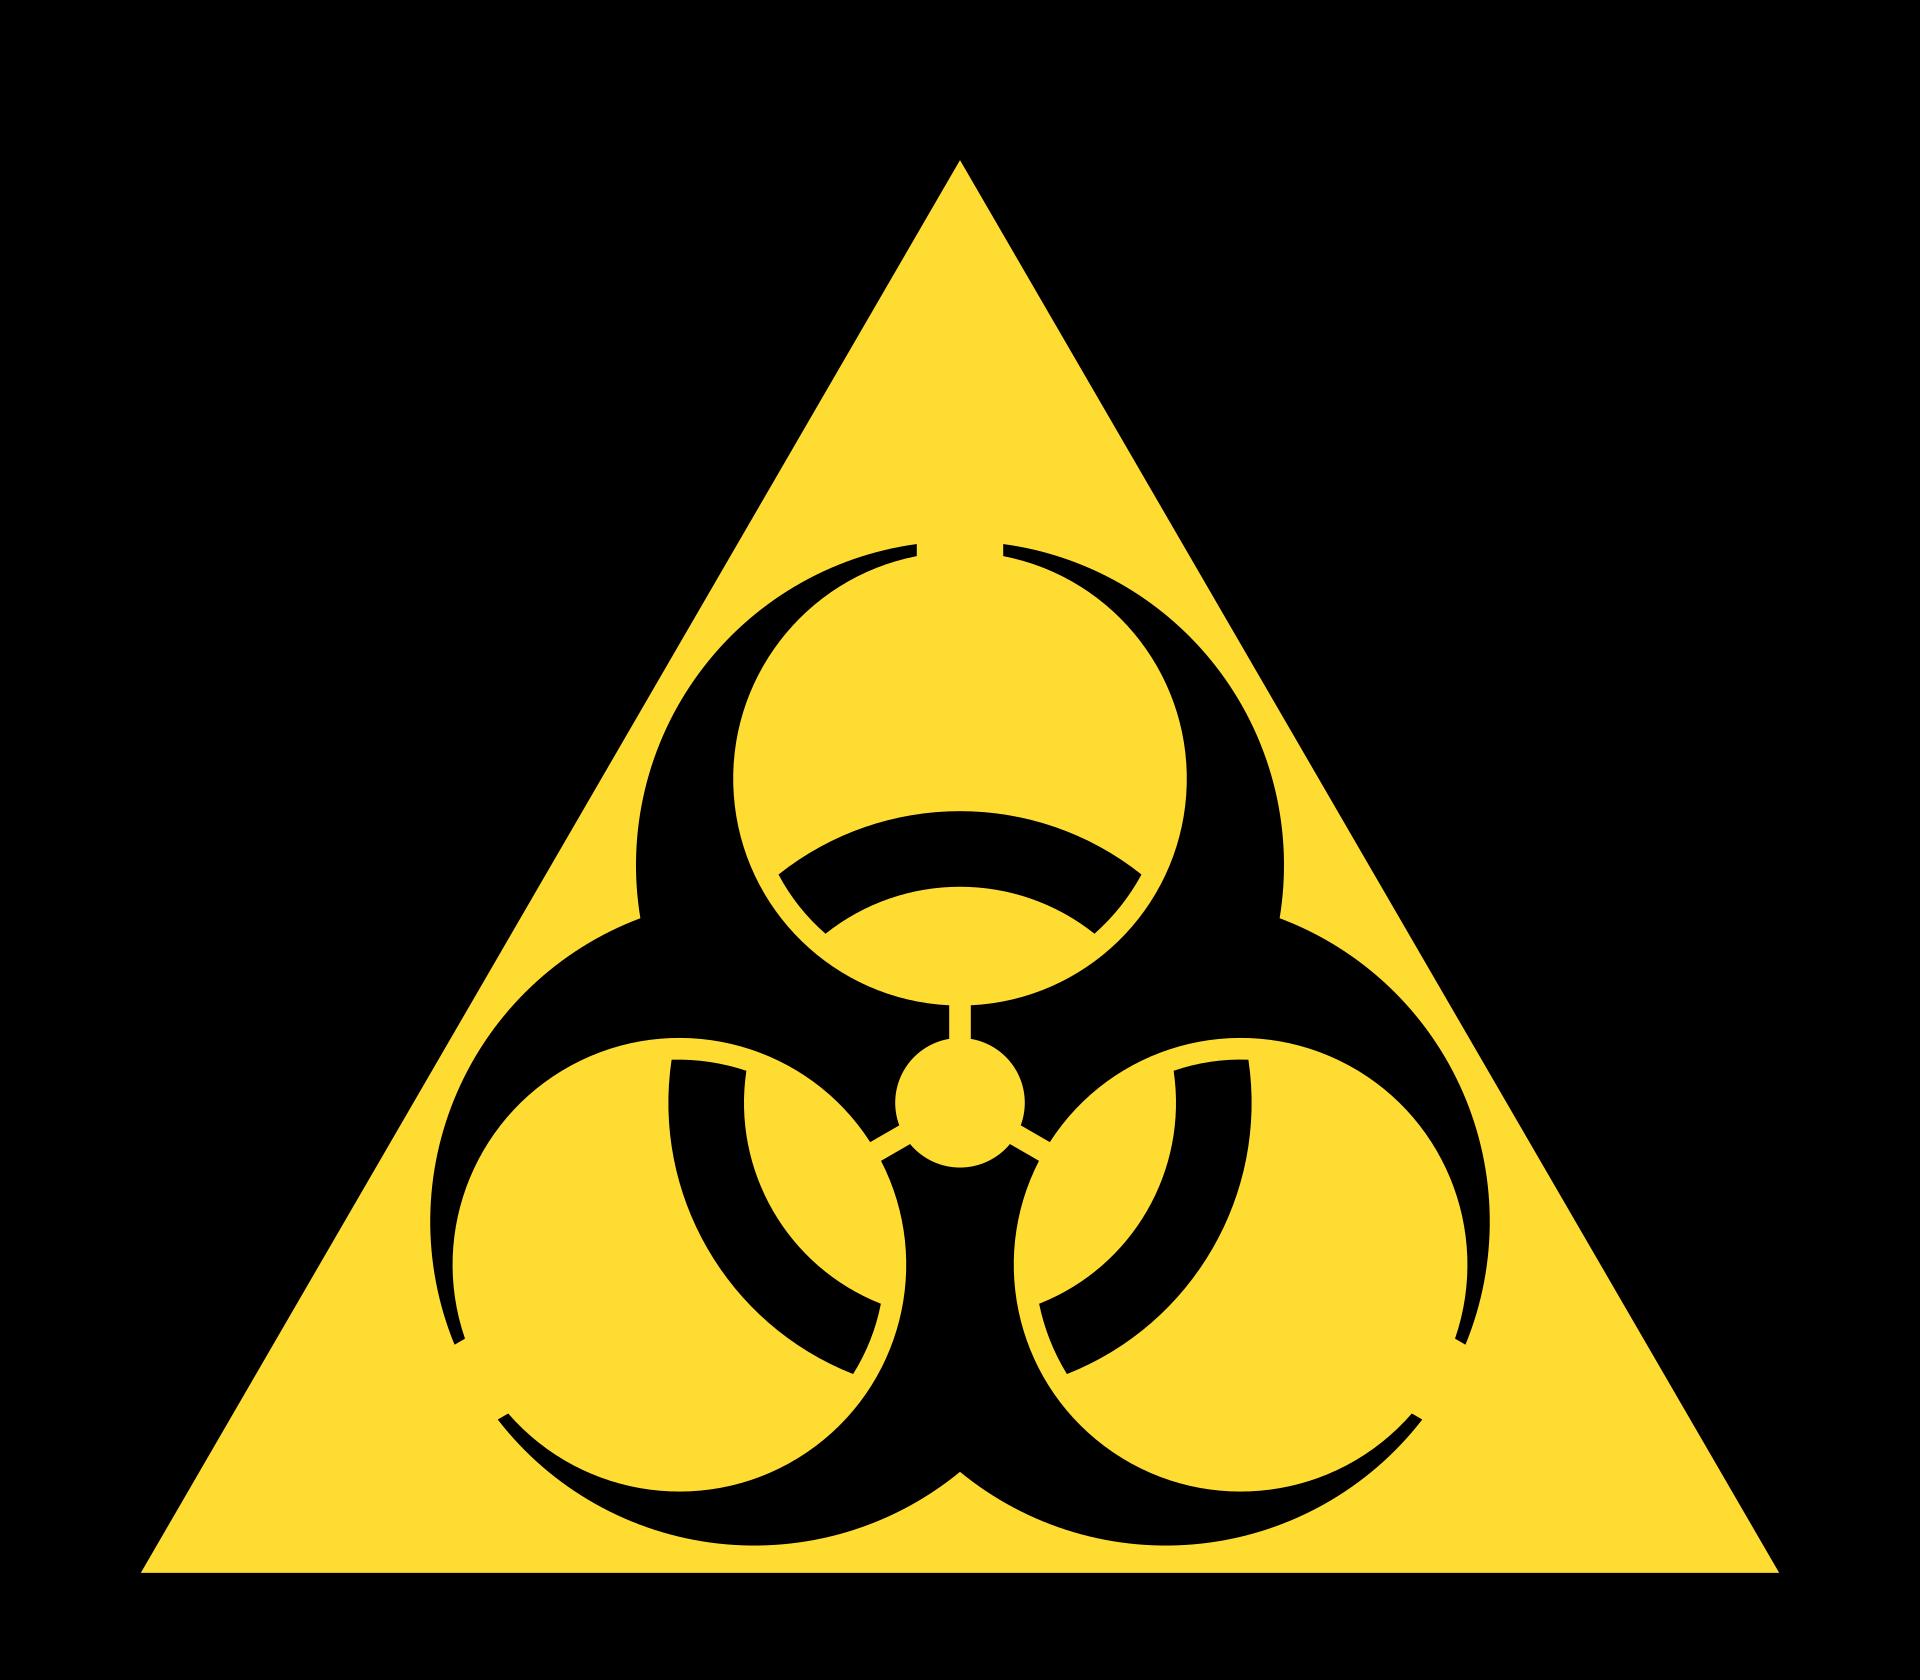 Biohazard Hazard Symbol Wikipedia Tatoeages